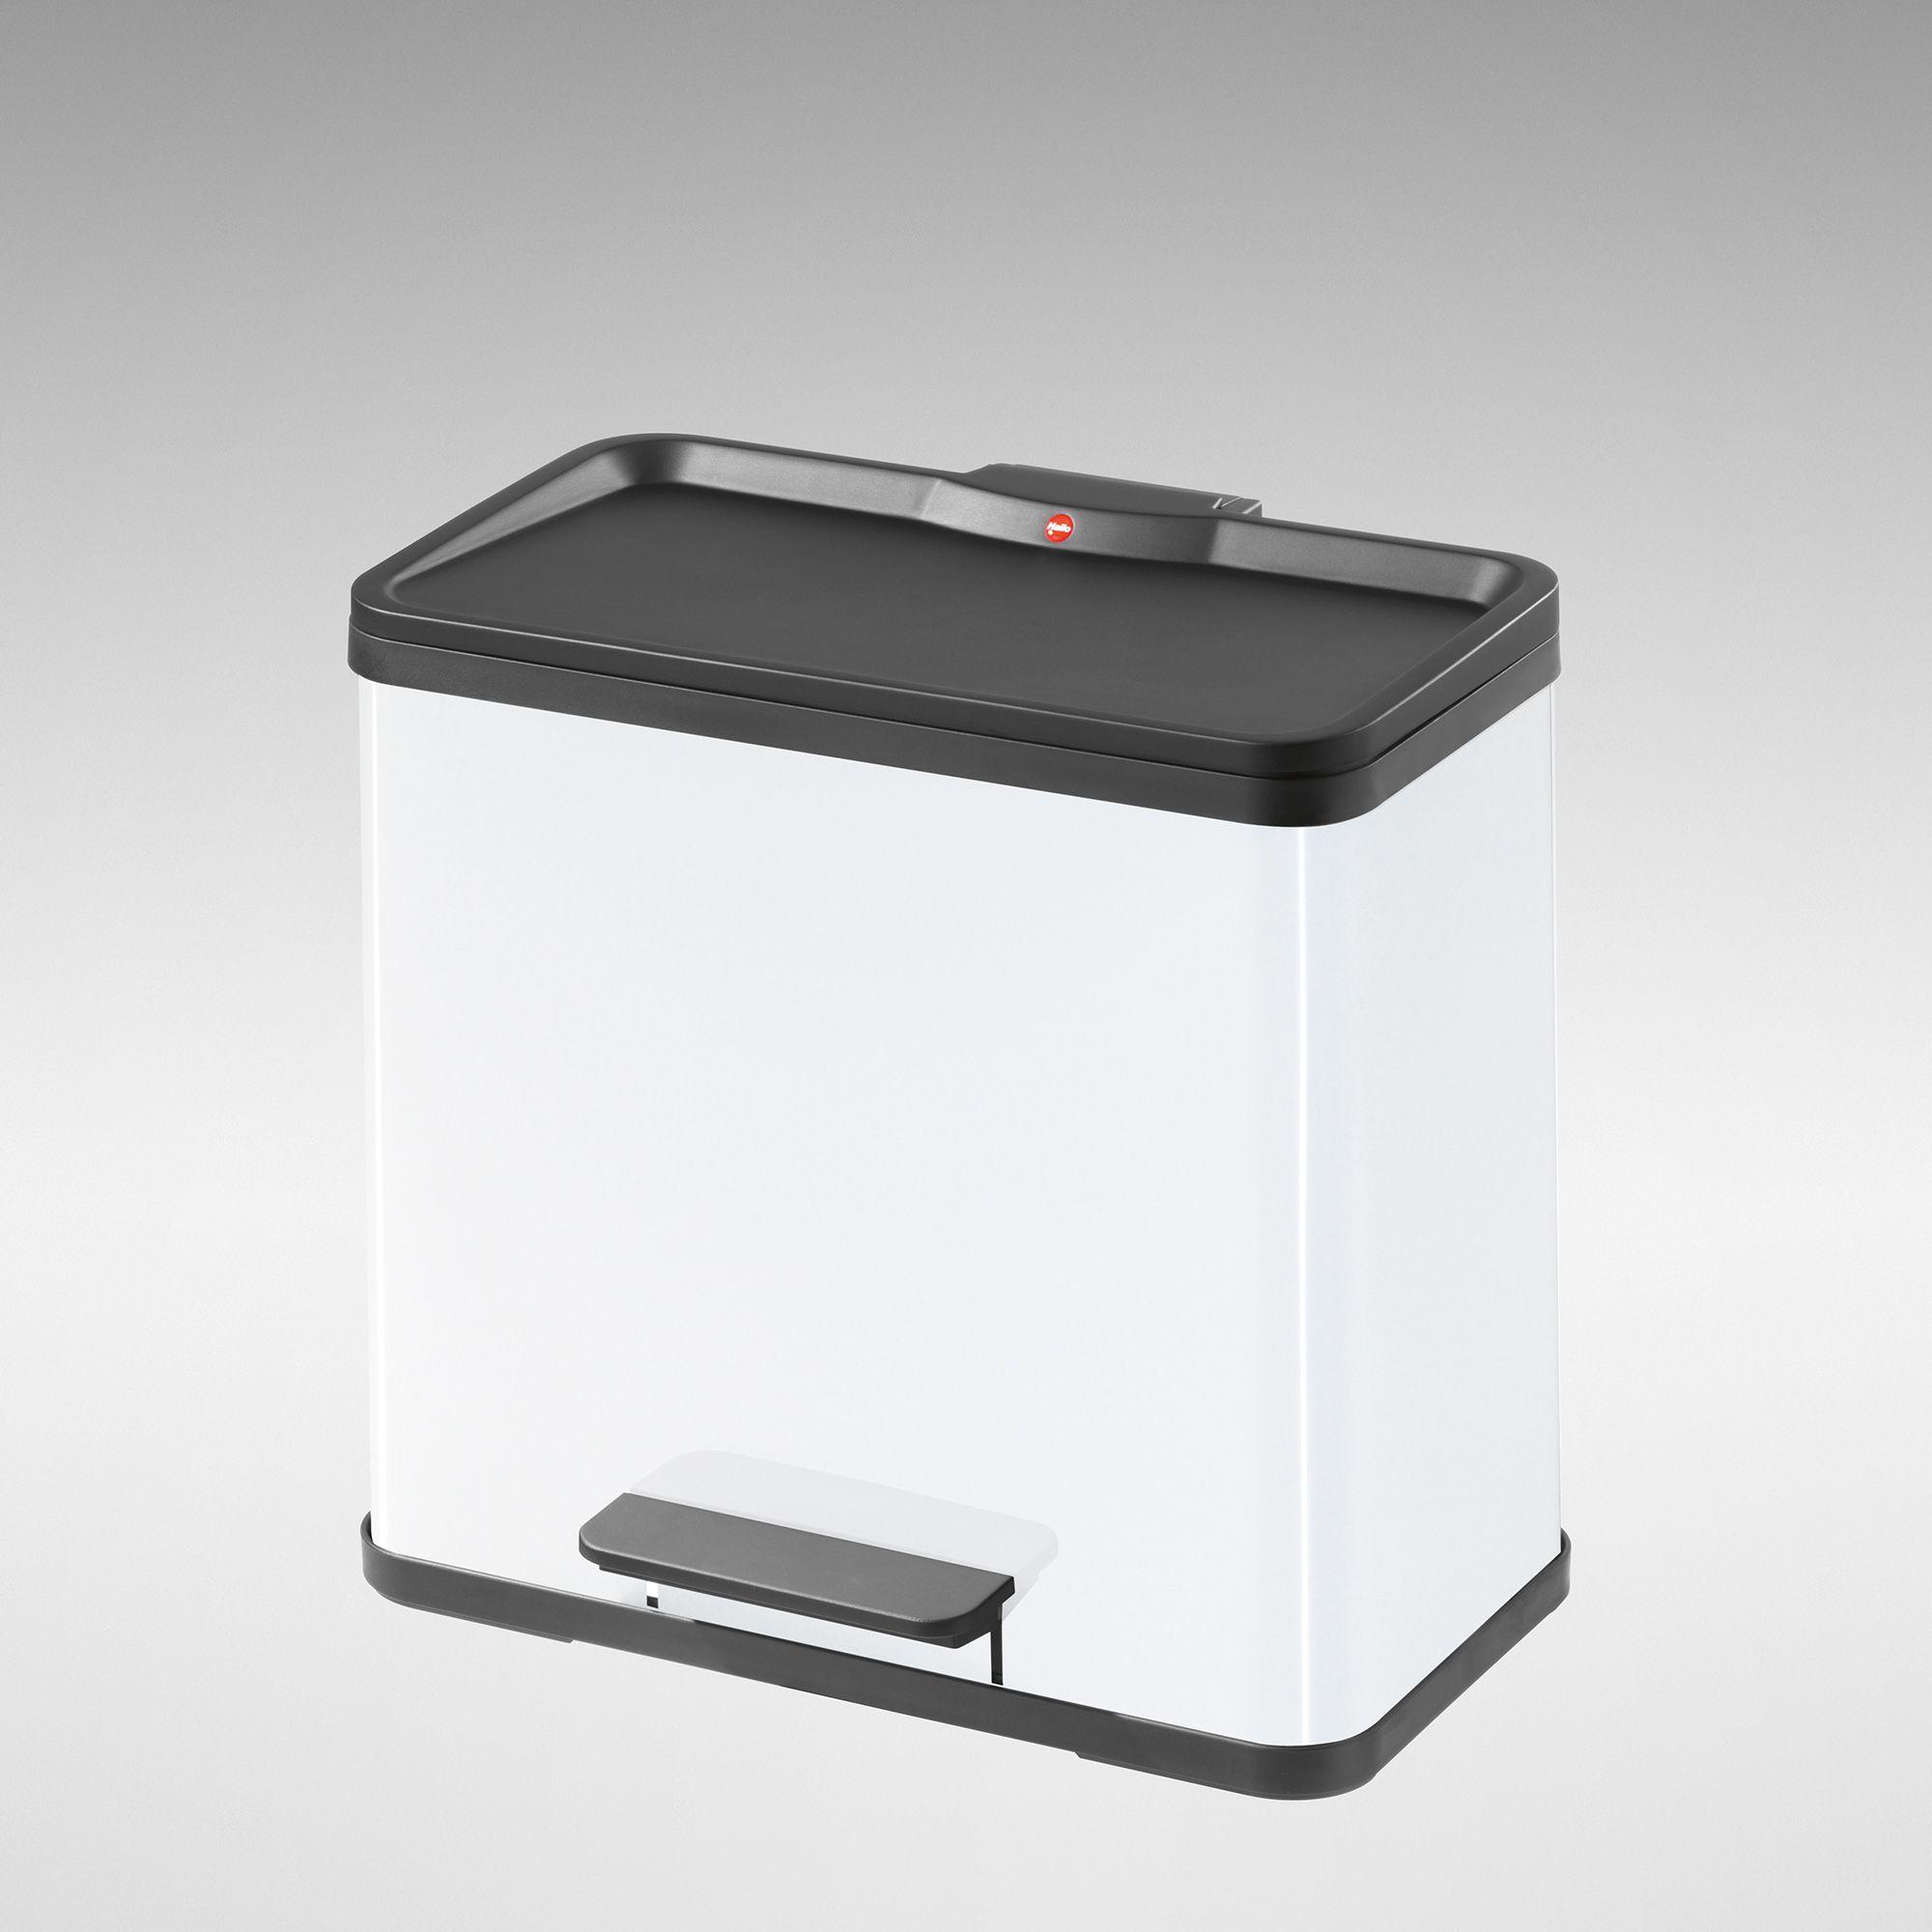 3 x 11L White Steel Pedal Waste Bin - 3 Compartments